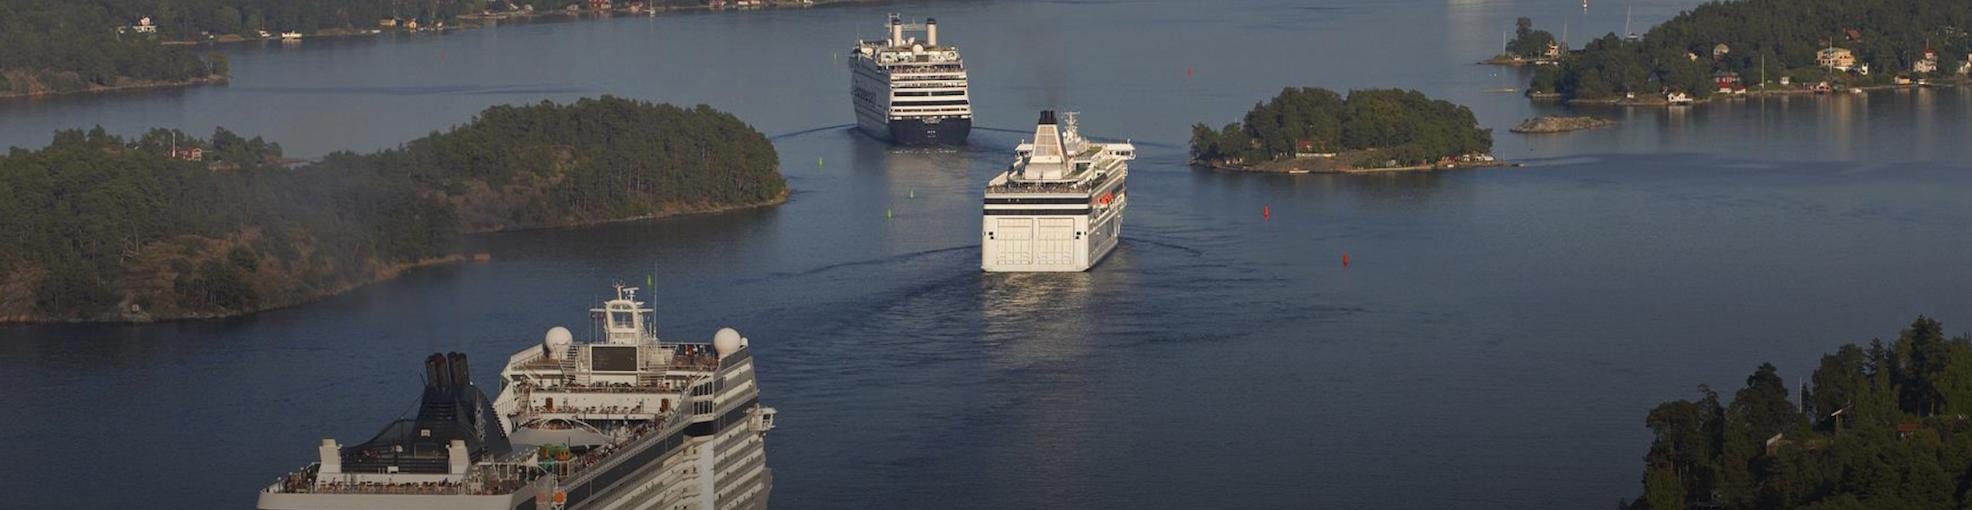 Ports of Stockholm